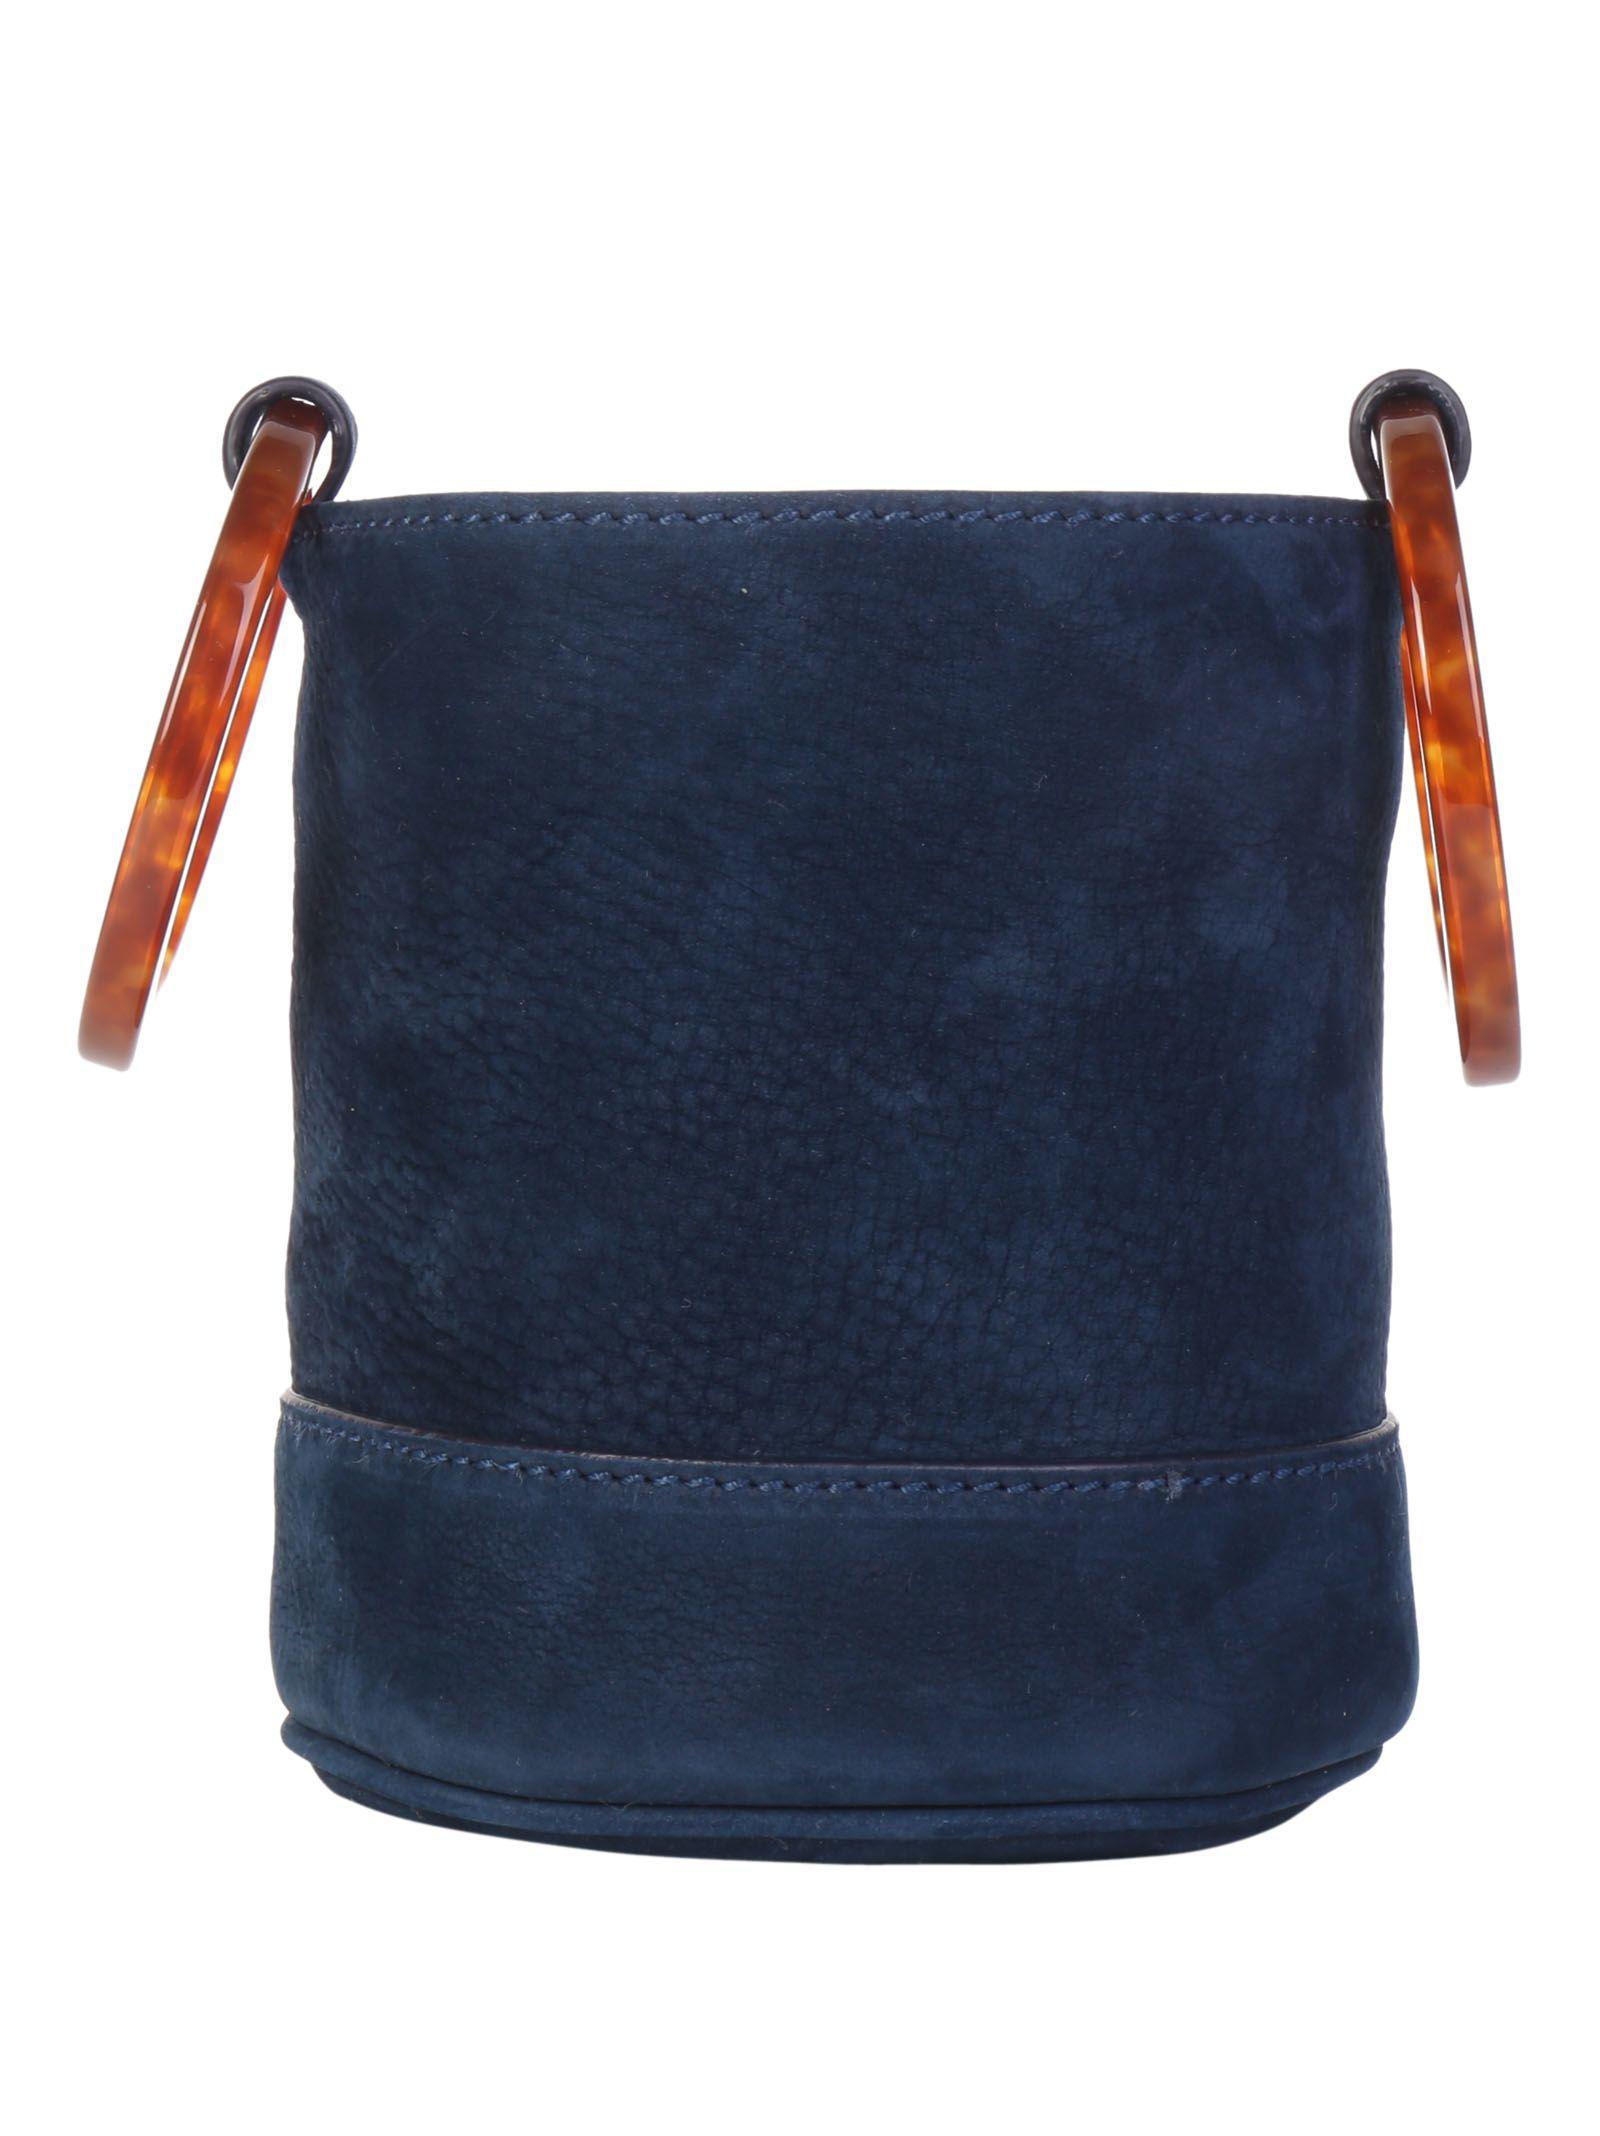 Simon Miller Bonsai Handbag In Smoke Blue